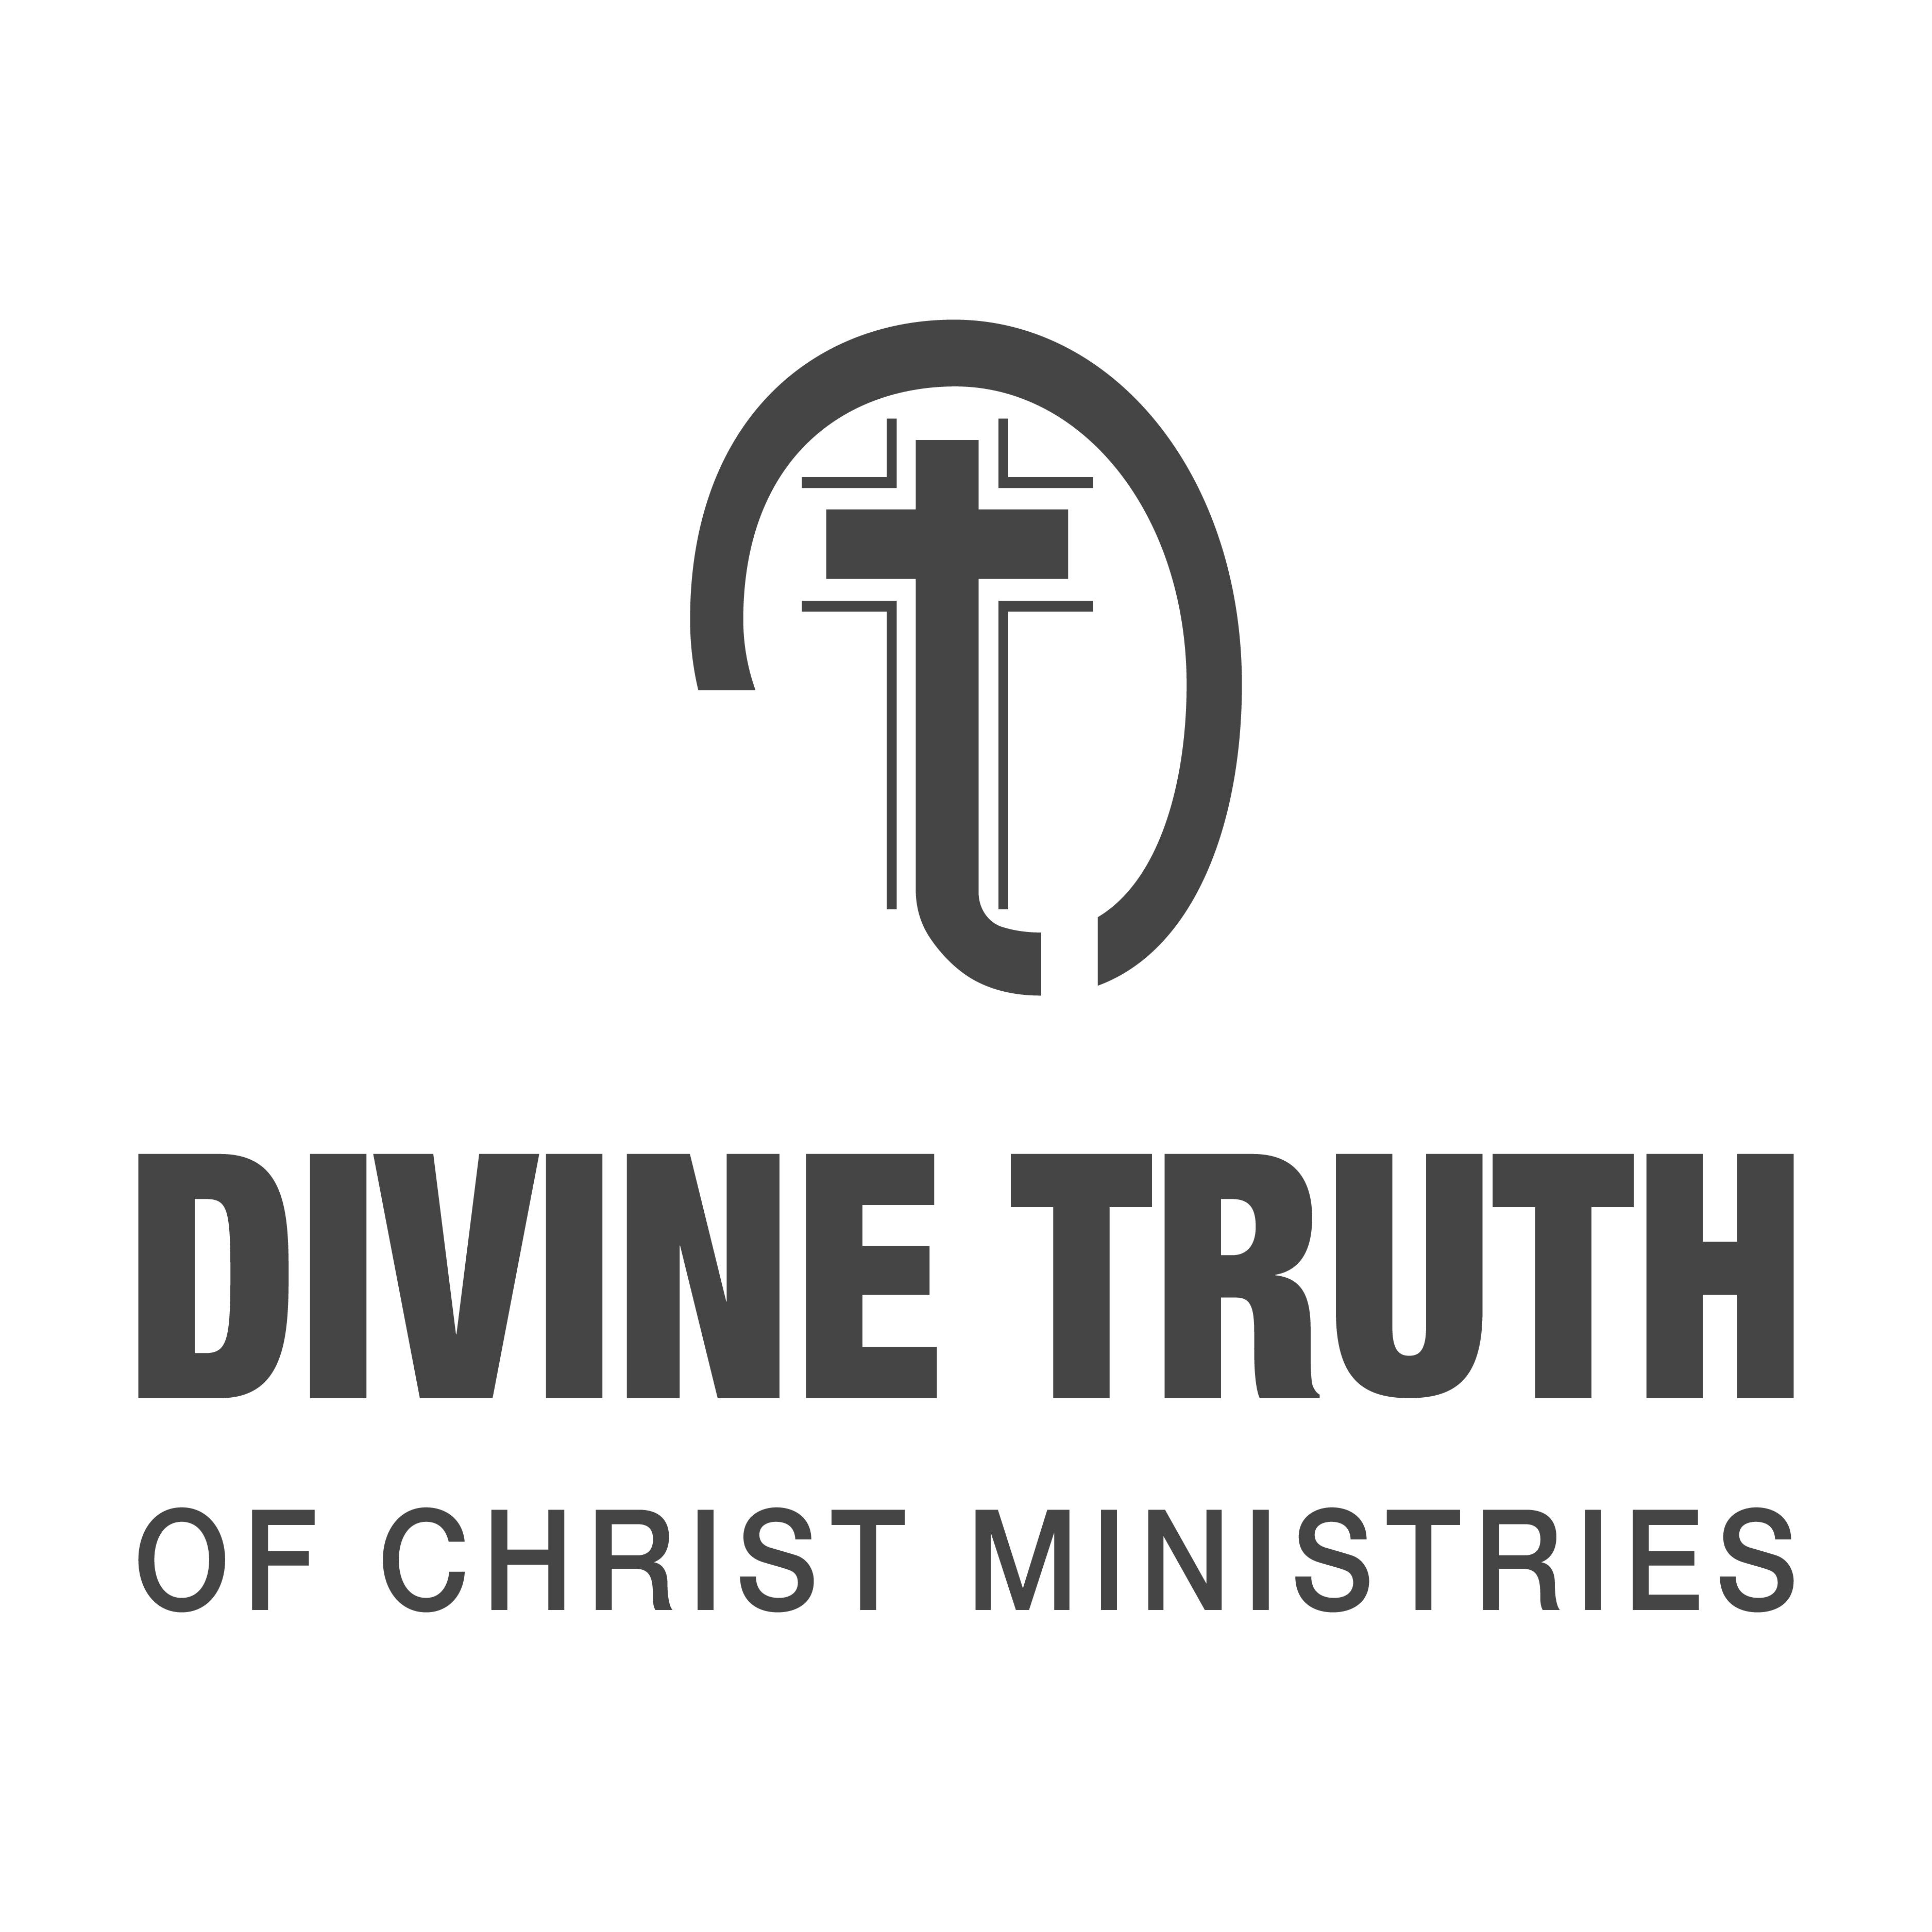 Divine Truth of Christ Ministries Logo logo design by logo designer Stewardesign Studios